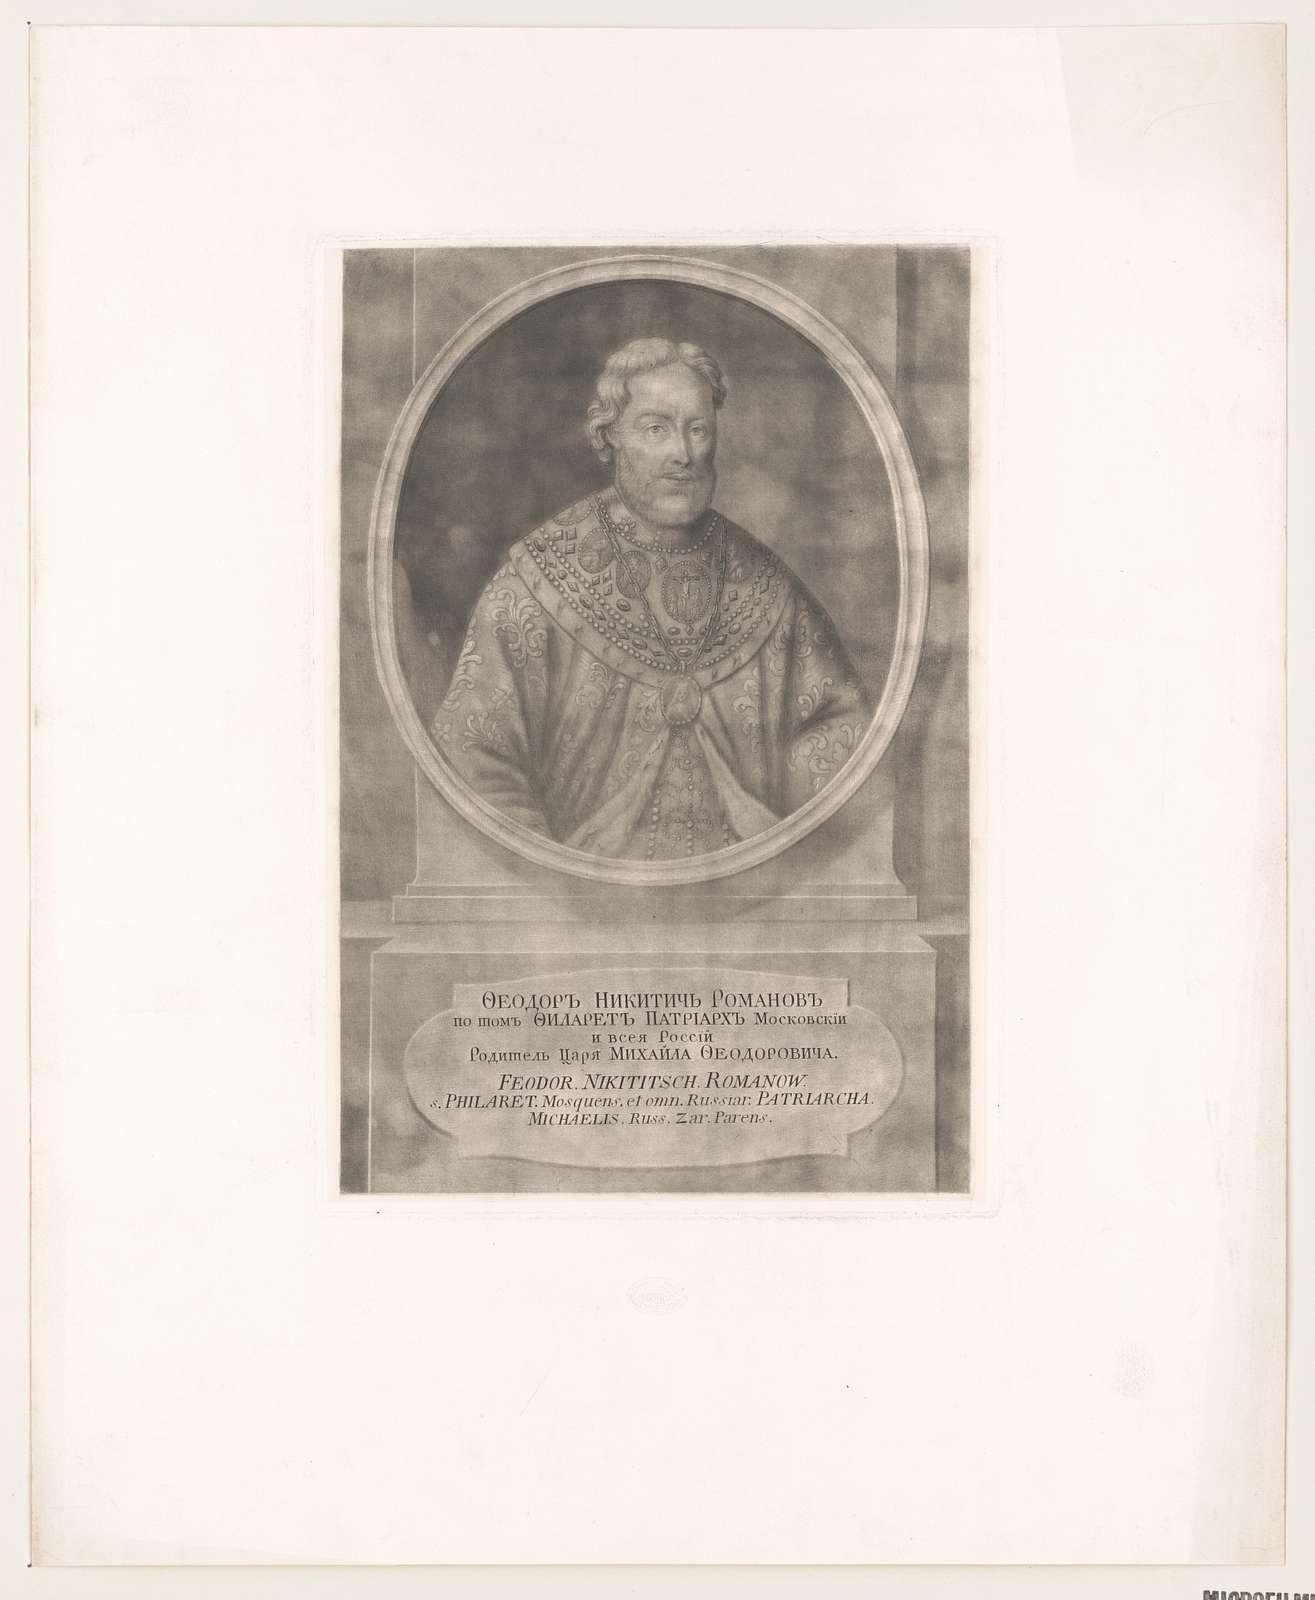 Feodor Nikititsch Romanow s. Philaret Mosquens et omn. Russiar, Patriarcha, Michaelis, Russ. zar parens